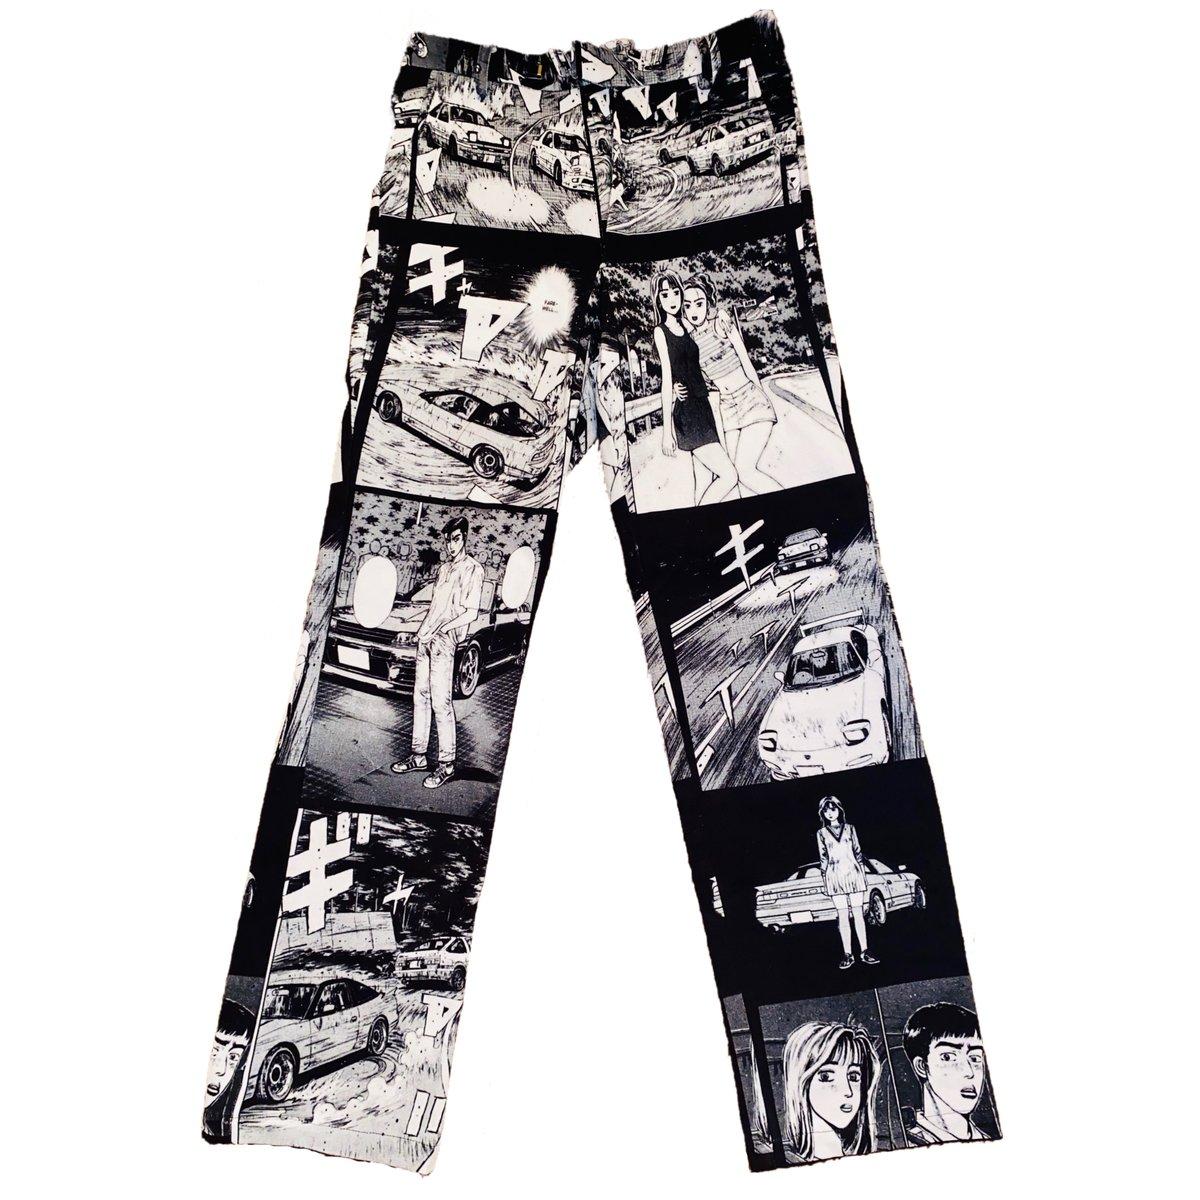 Image of Initial D Pants